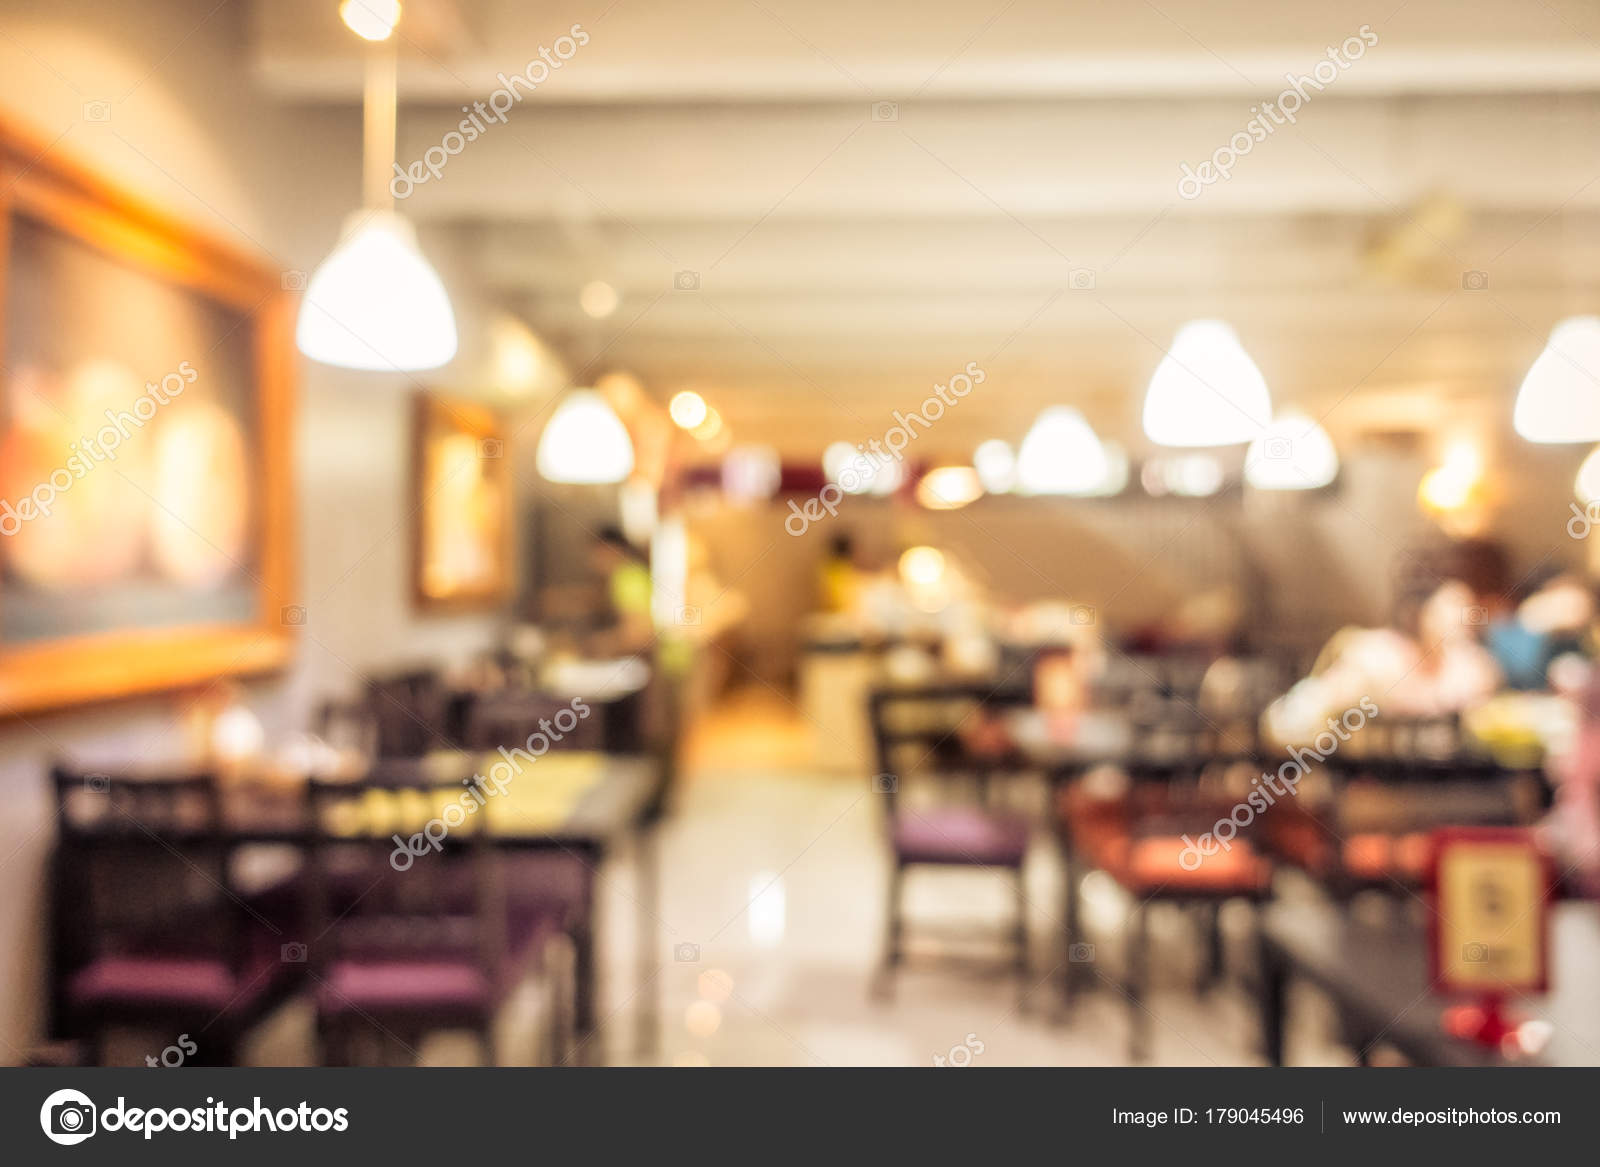 Abstract Blur Coffee Shop Cafe Restaurant Interior Background Vintage Filter Stock Photo C Mrsiraphol 179045496